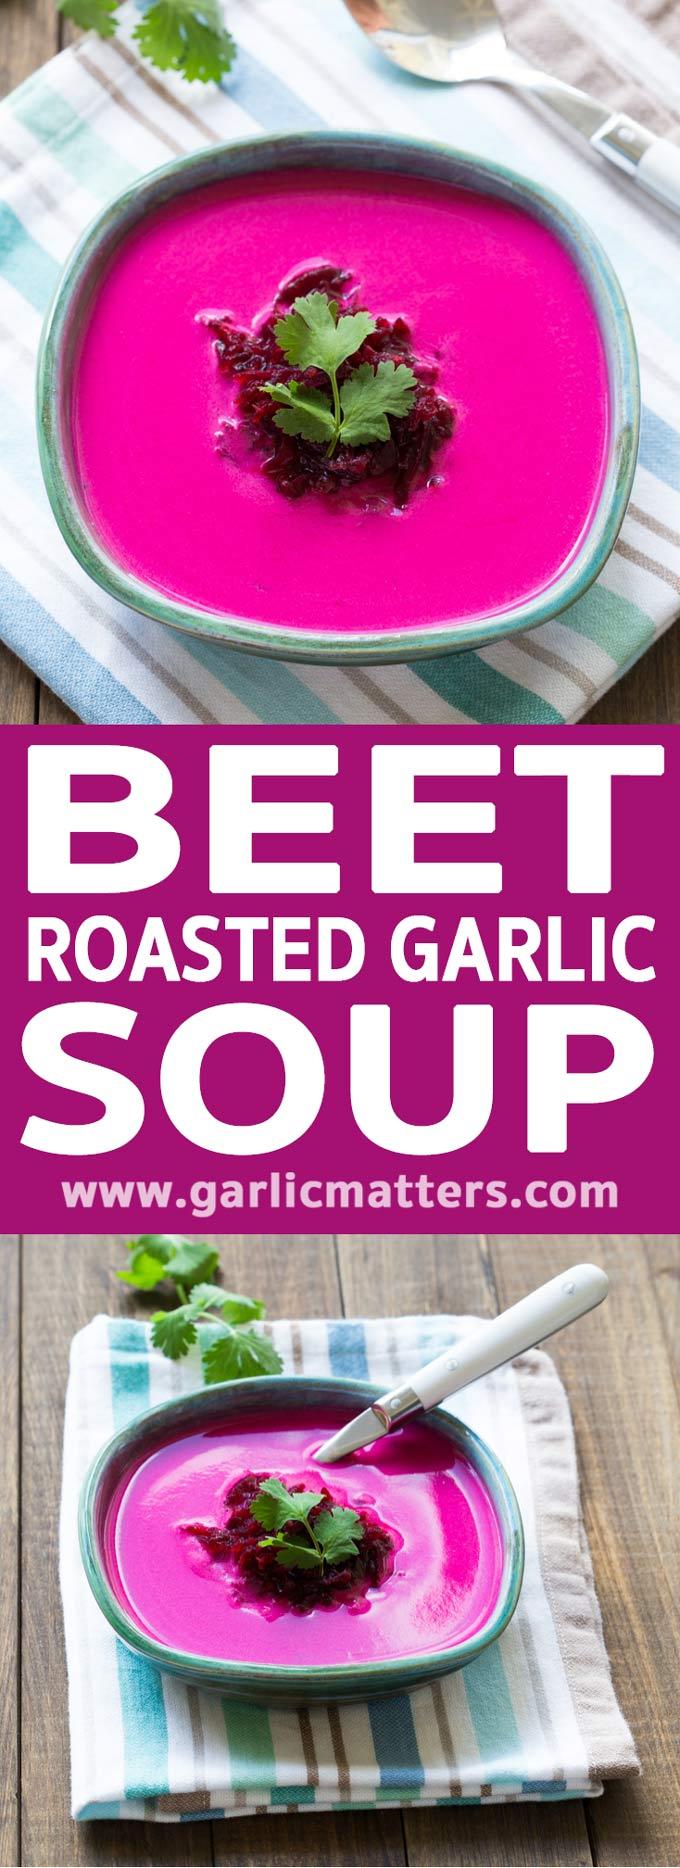 Beet and Roasted Garlic Soup | Garlic Matters